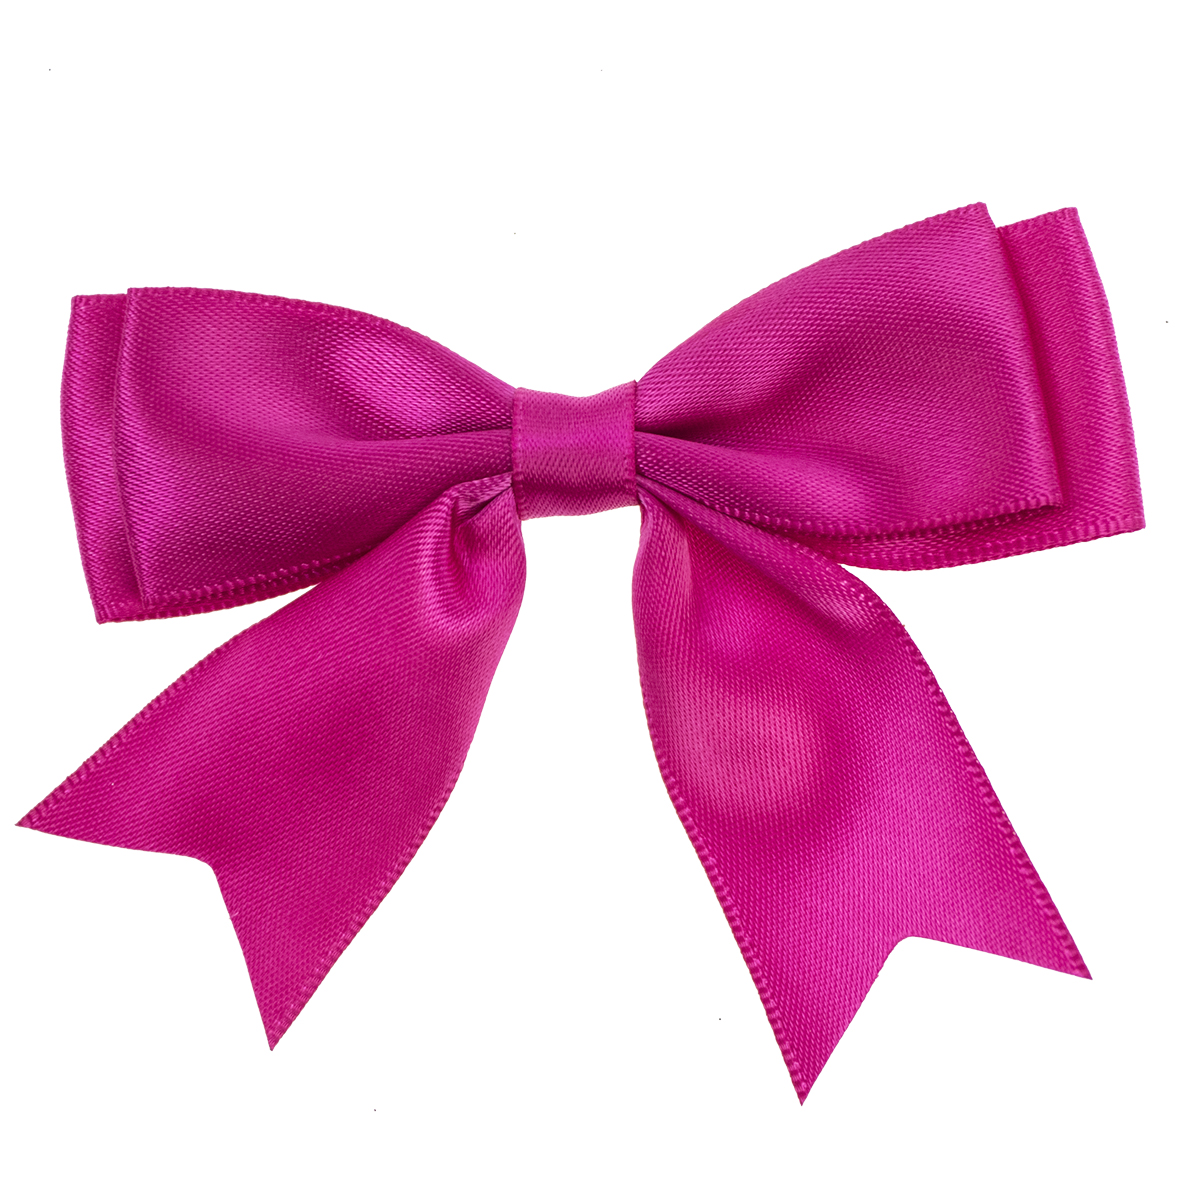 ribbon bow tie - HD1181×1181